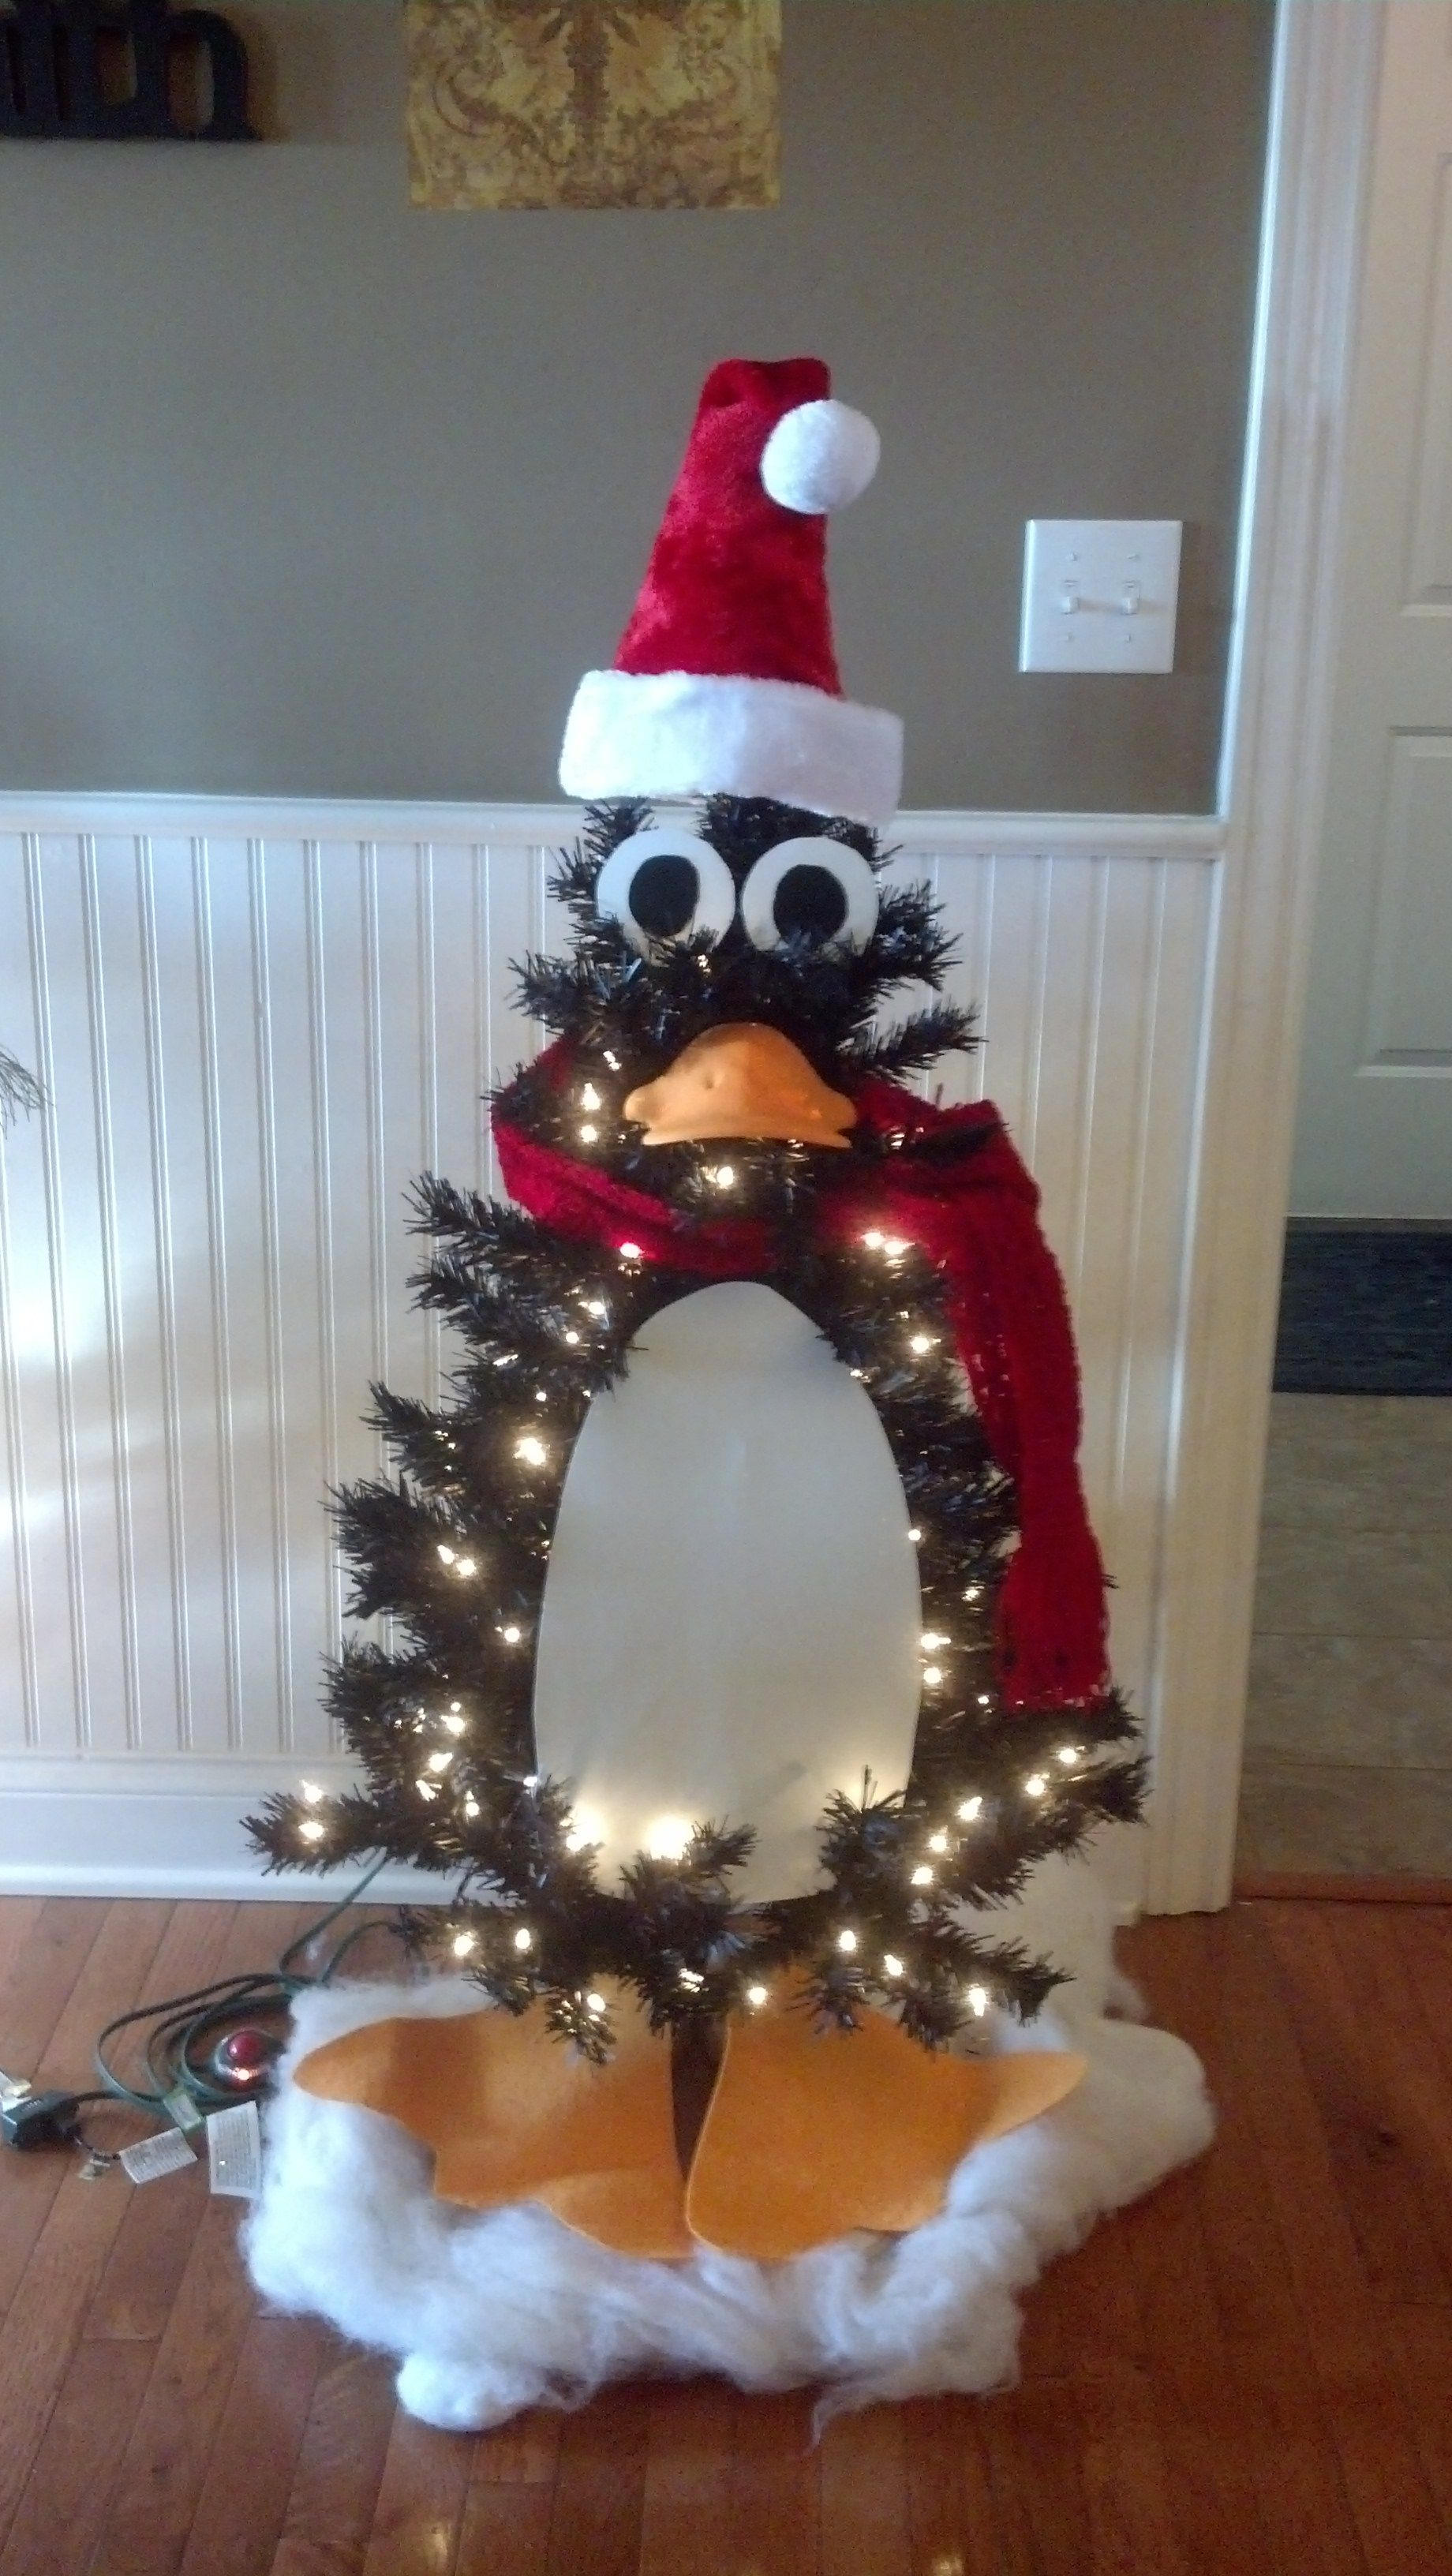 Penguin Christmas Tree. 4 Ft Black Pre-lit Tree